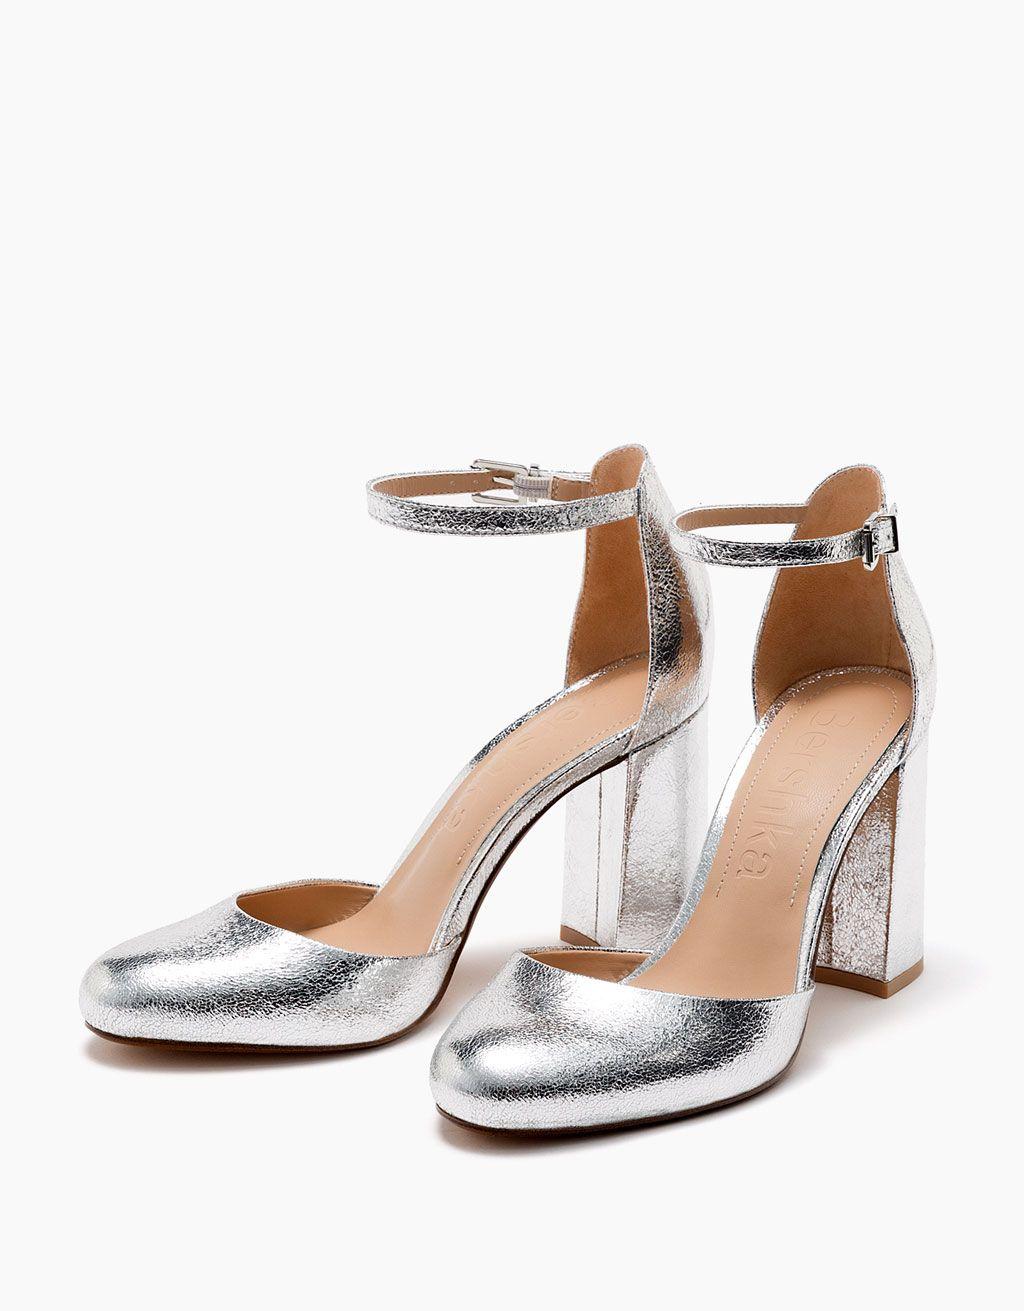 Mujer Zapatos Tejido Verano Tacón Cuadrado / Talón de bloque Hebilla / Cremallera / Borla Negro / Sandalias de Tacón nL1oH3Ims